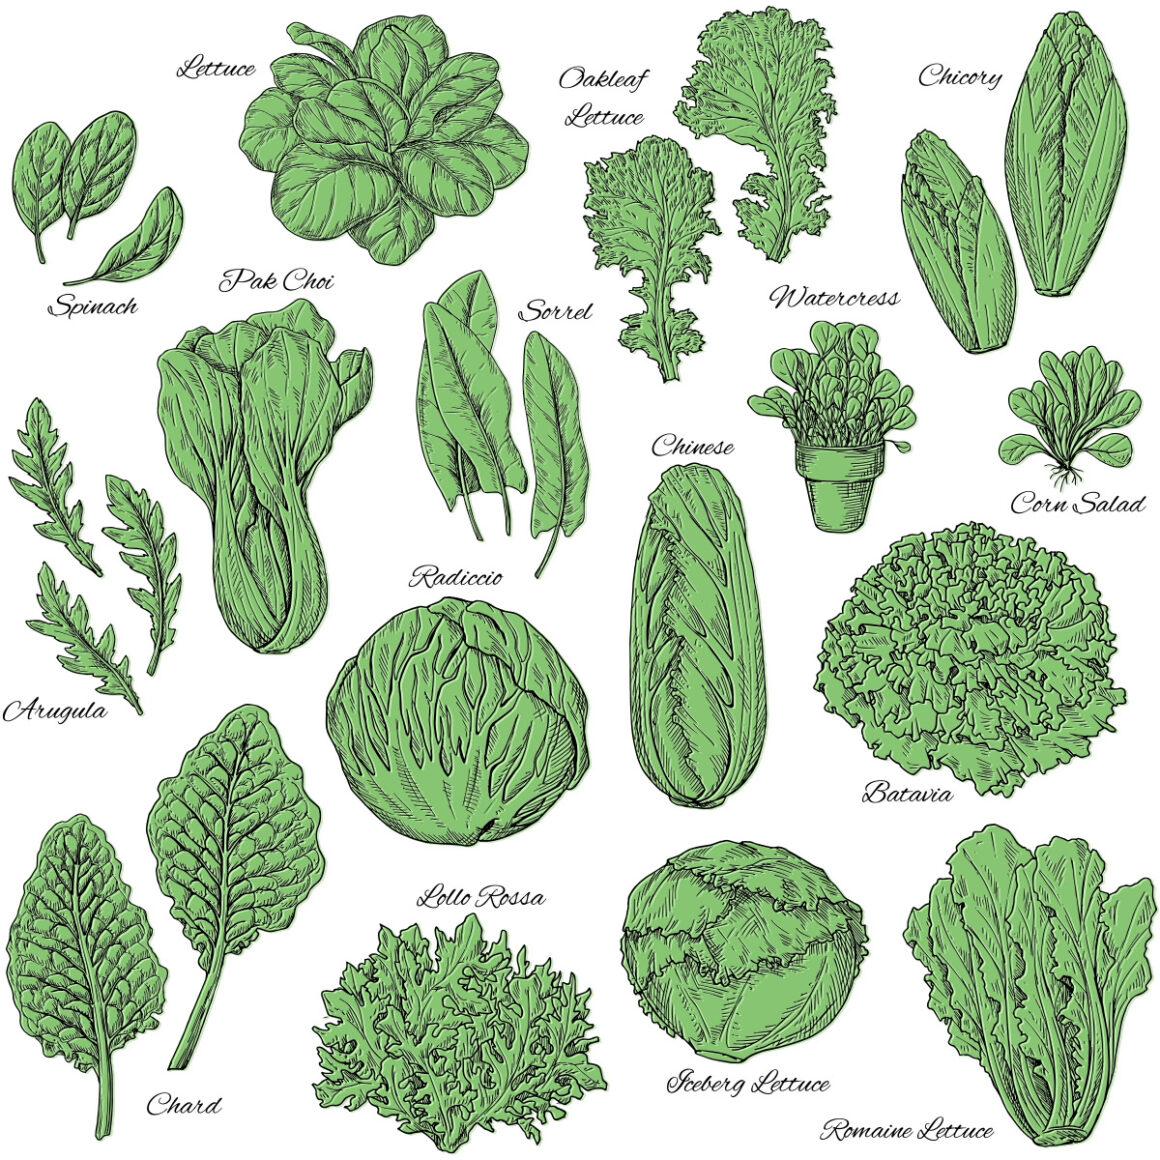 Various types of salad greens